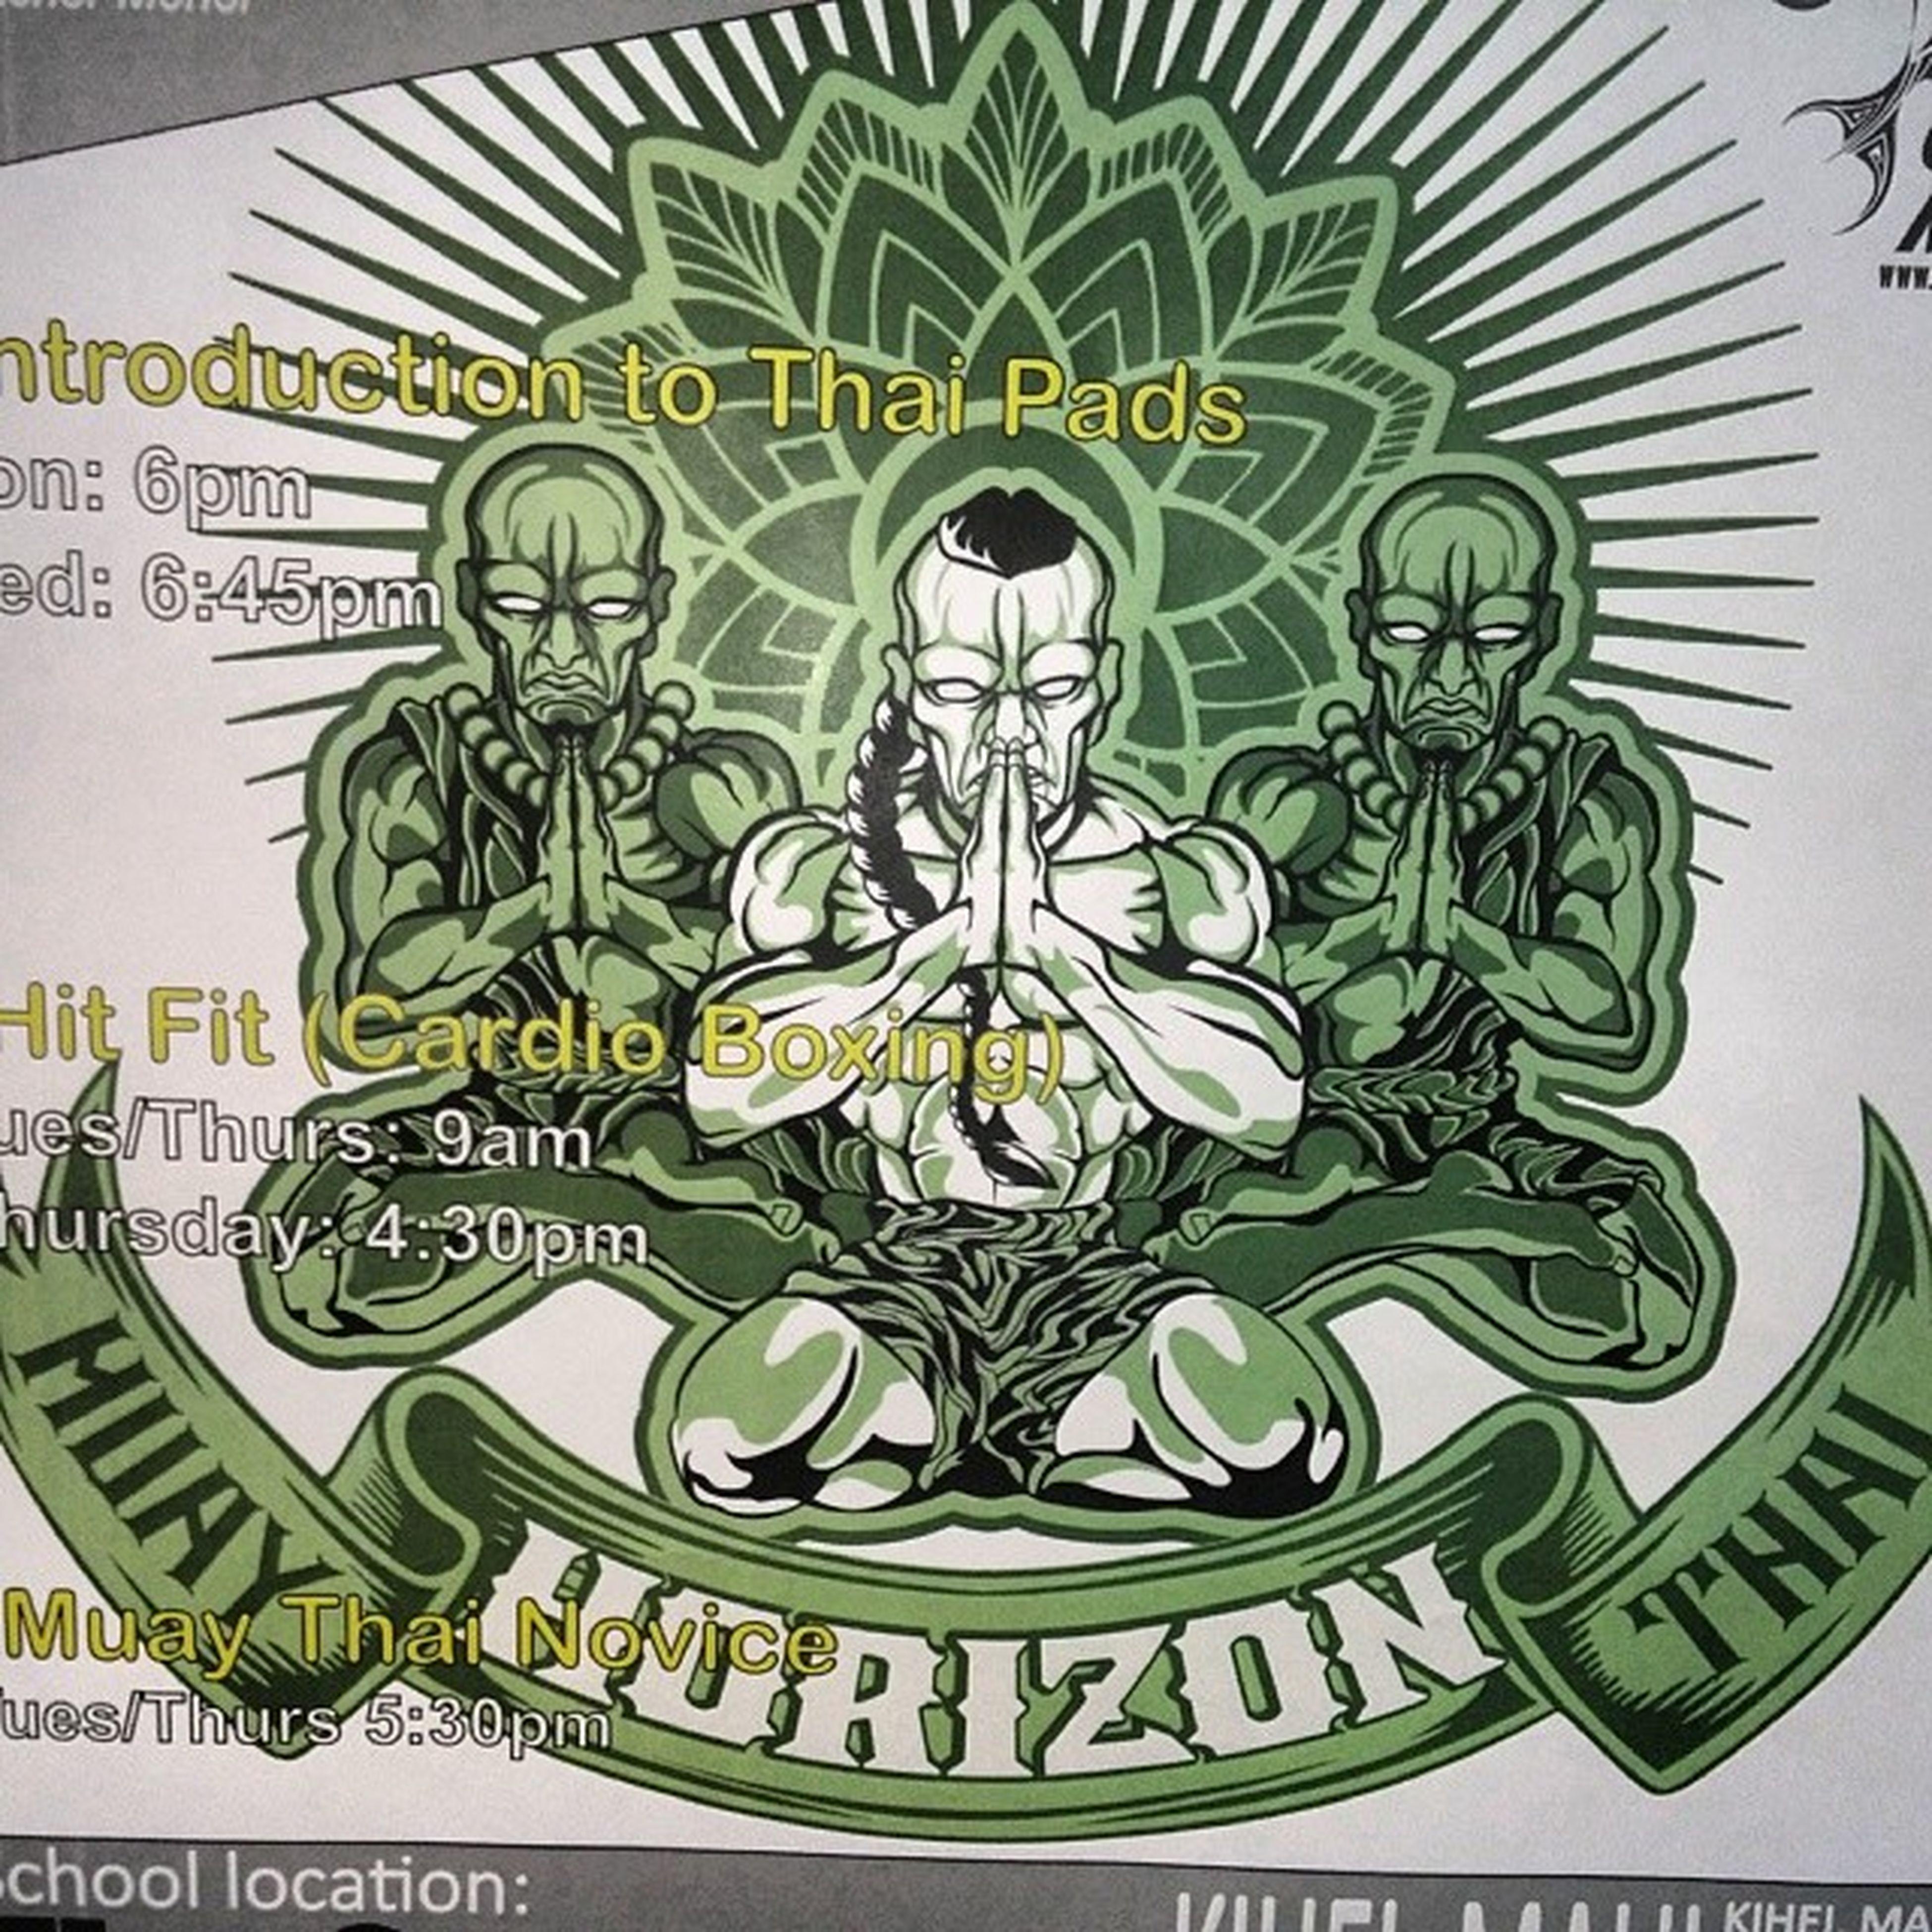 Put in another session HorizonMuayThai ArtOfEight Healthylife DoWorkUce OnThatVaiAiku